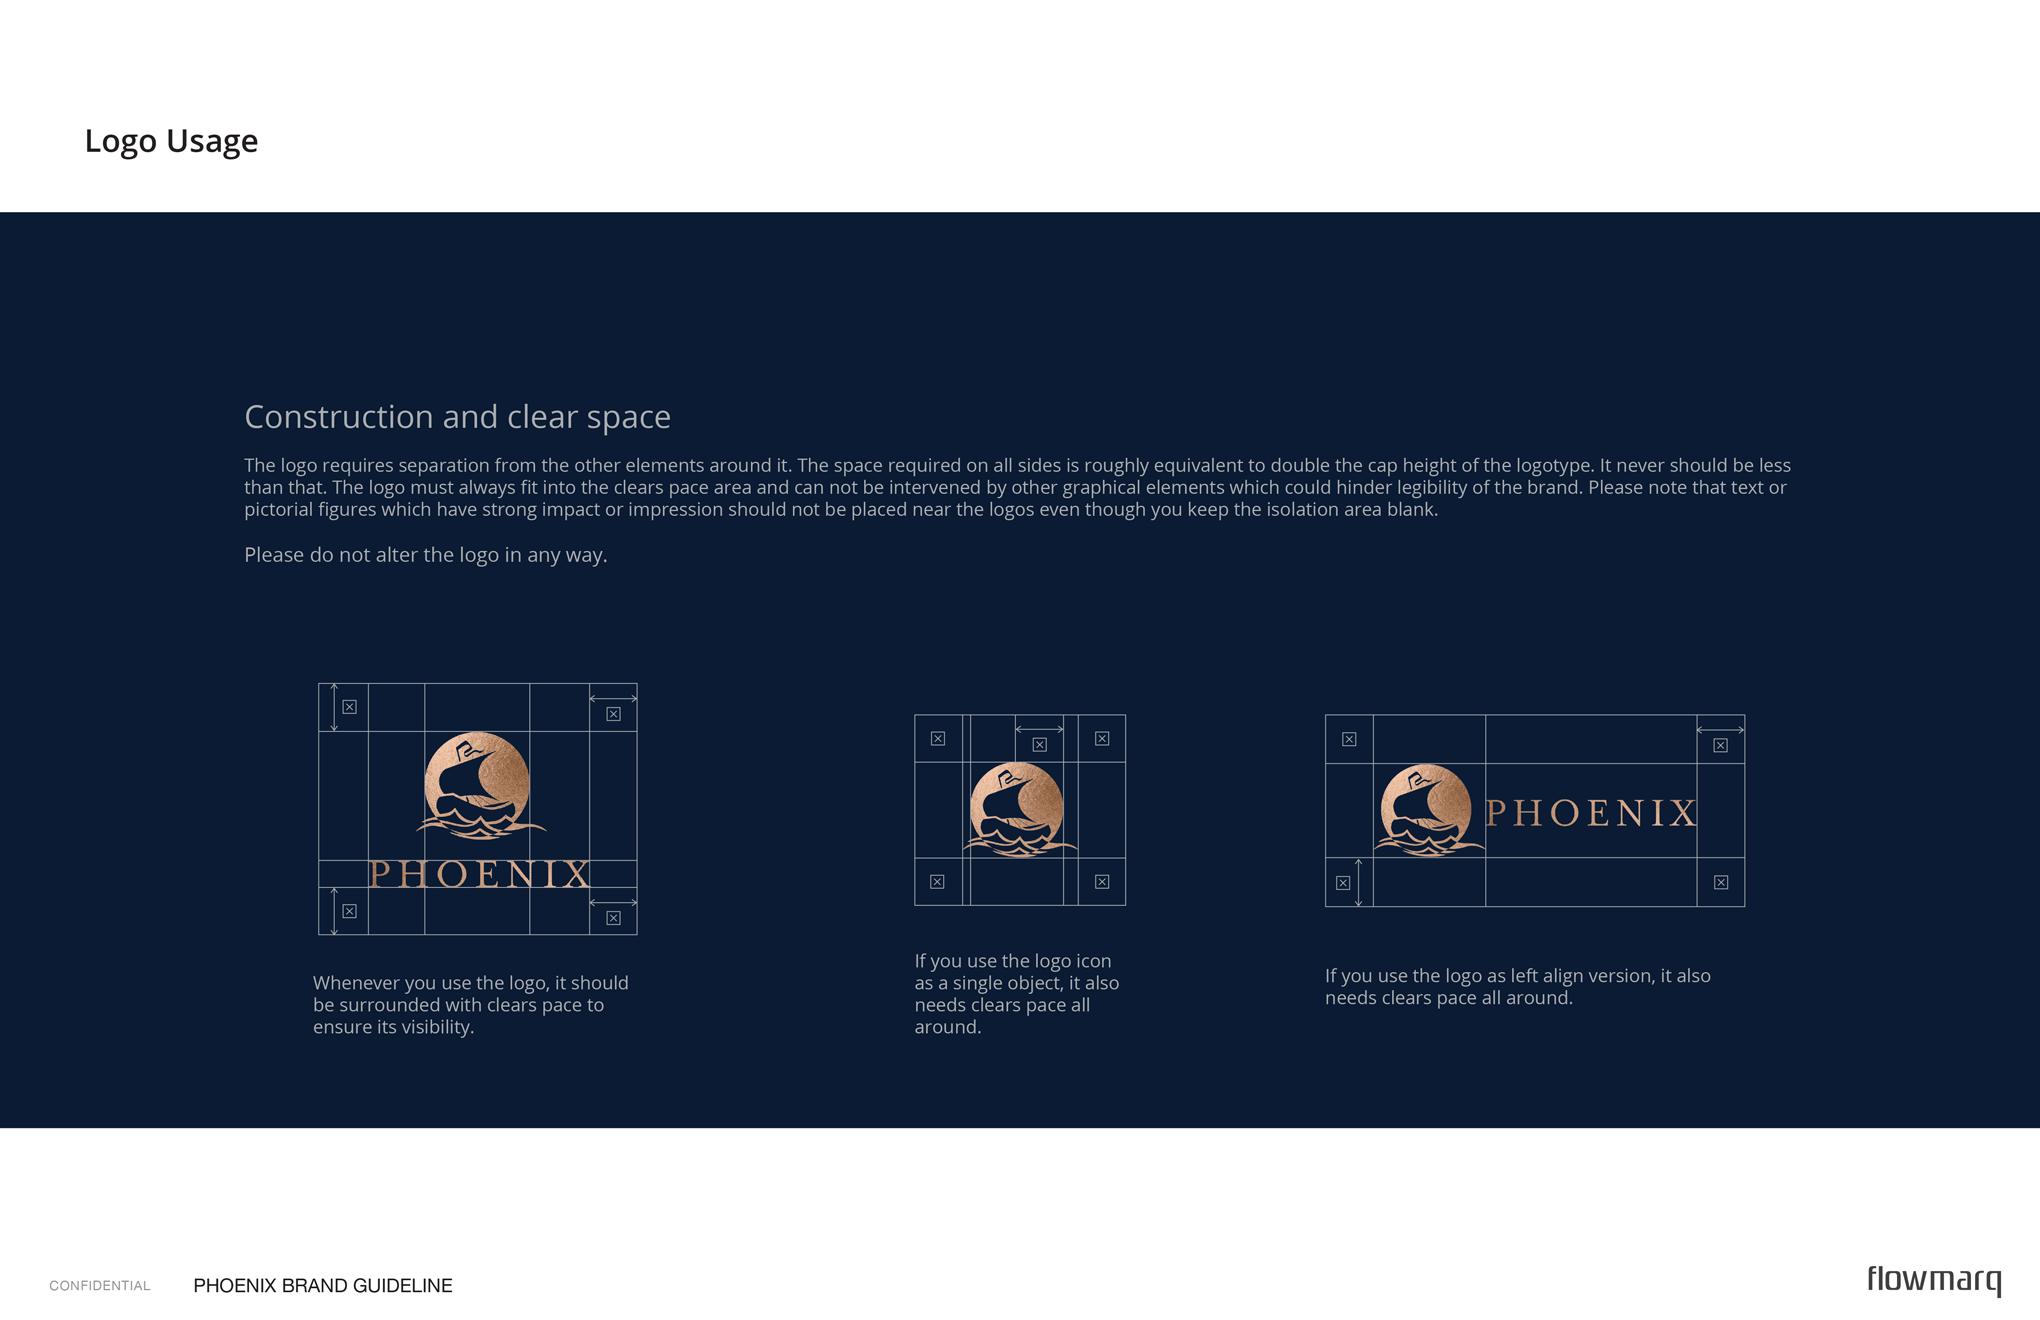 Phoenix - branding guide logo usage & space